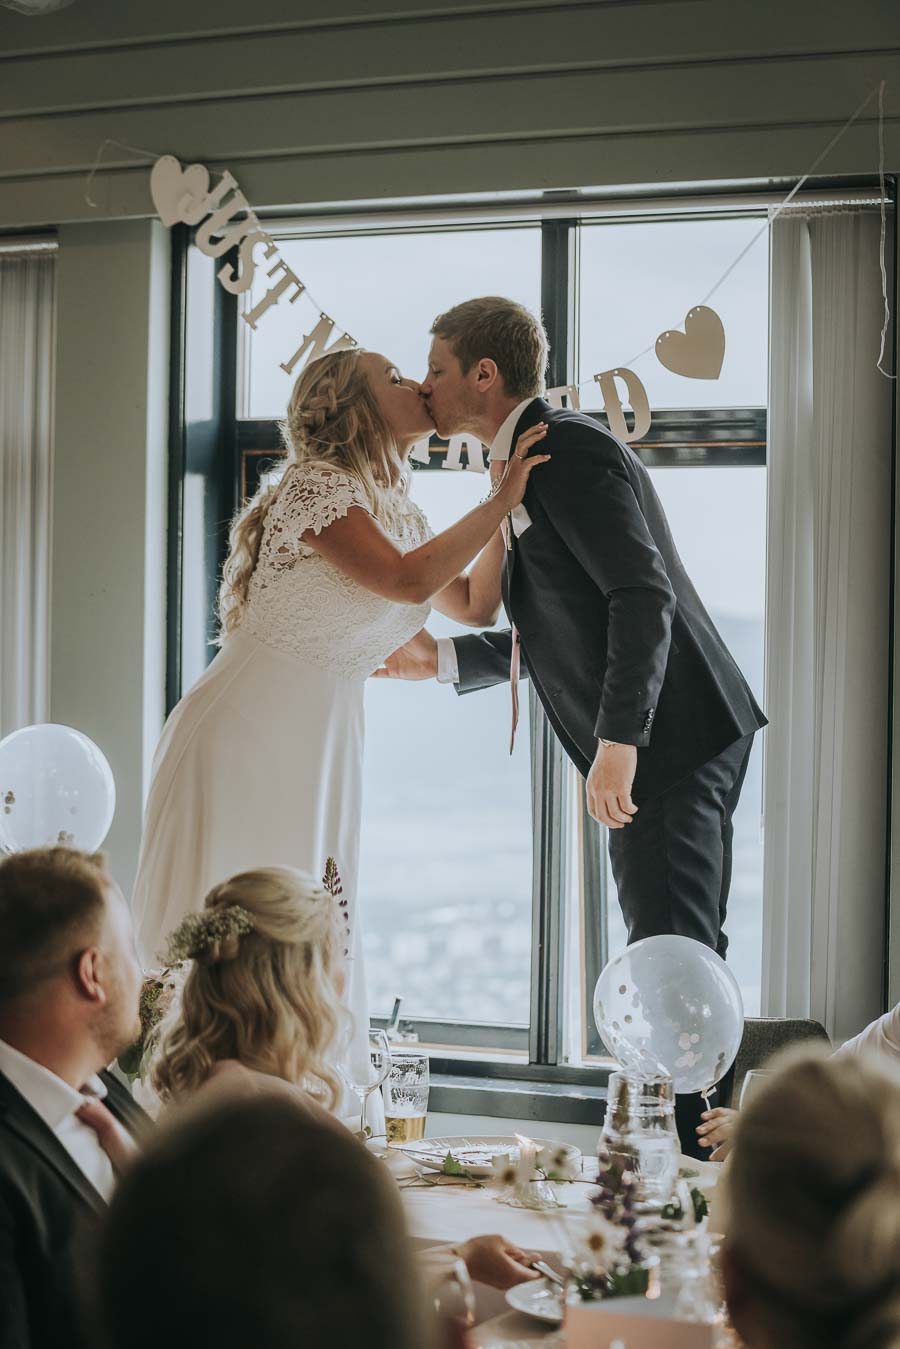 Brud og brudgom kysser